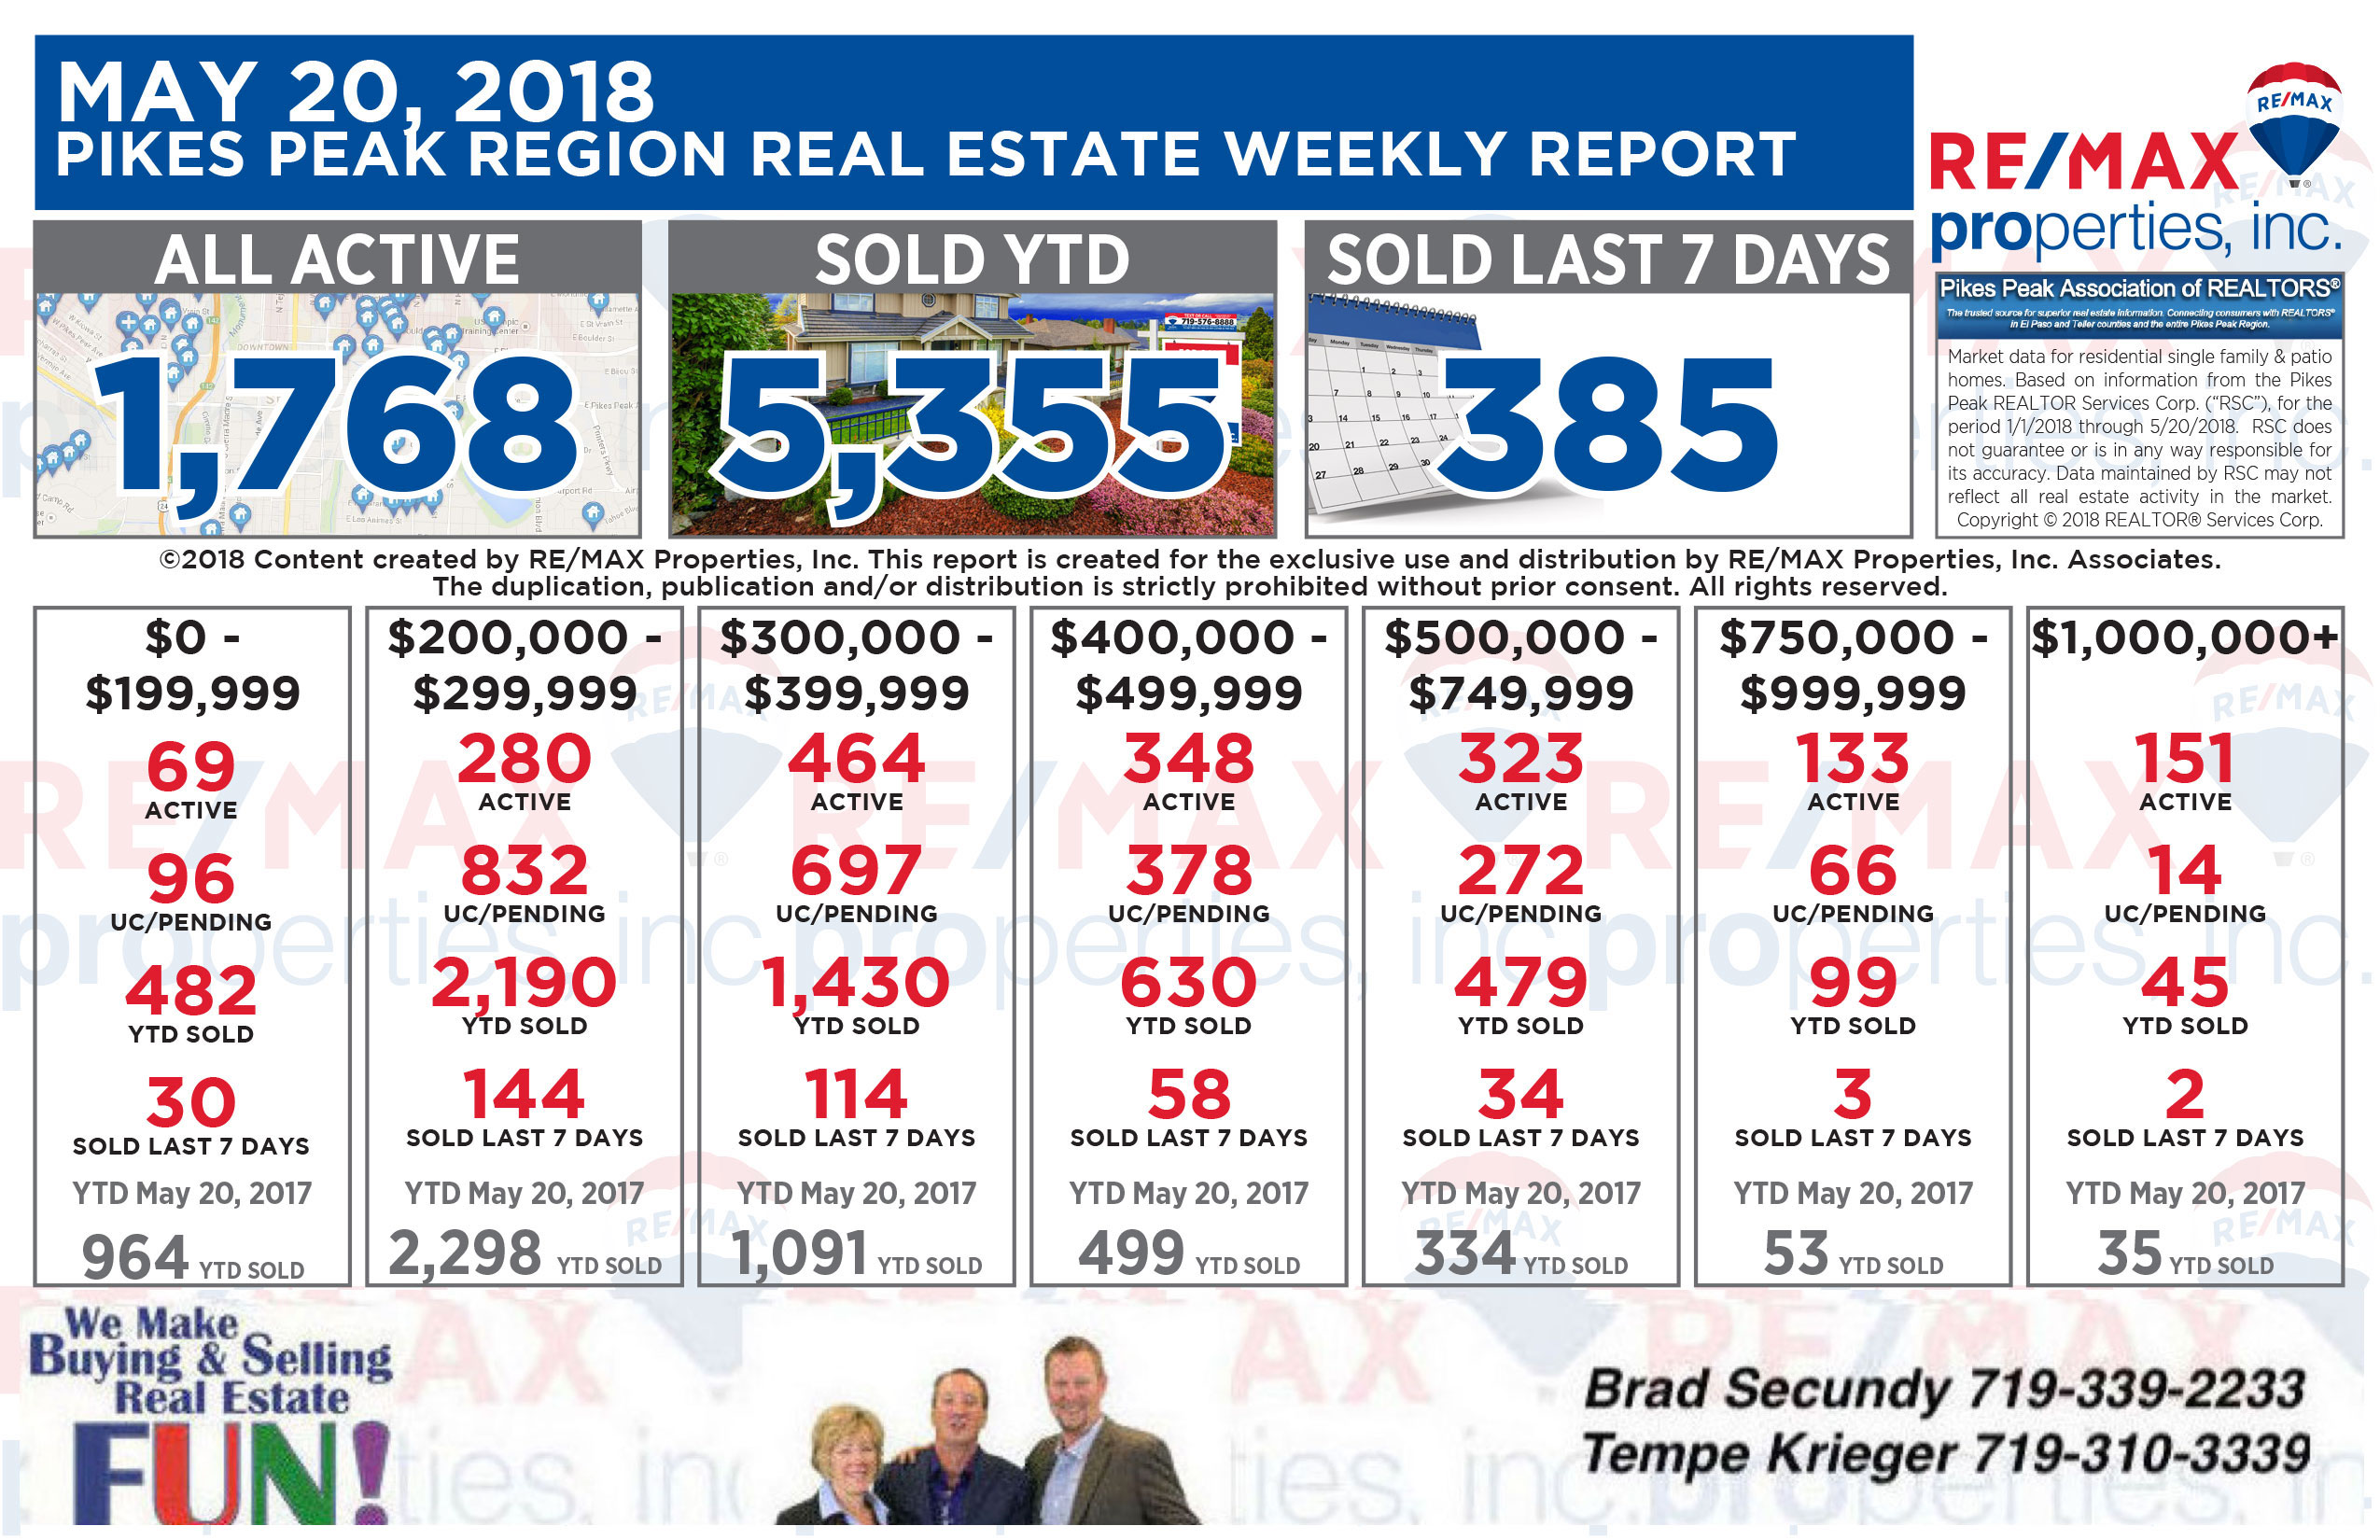 Colorado Springs Real Estate Statistics 5-20-2018